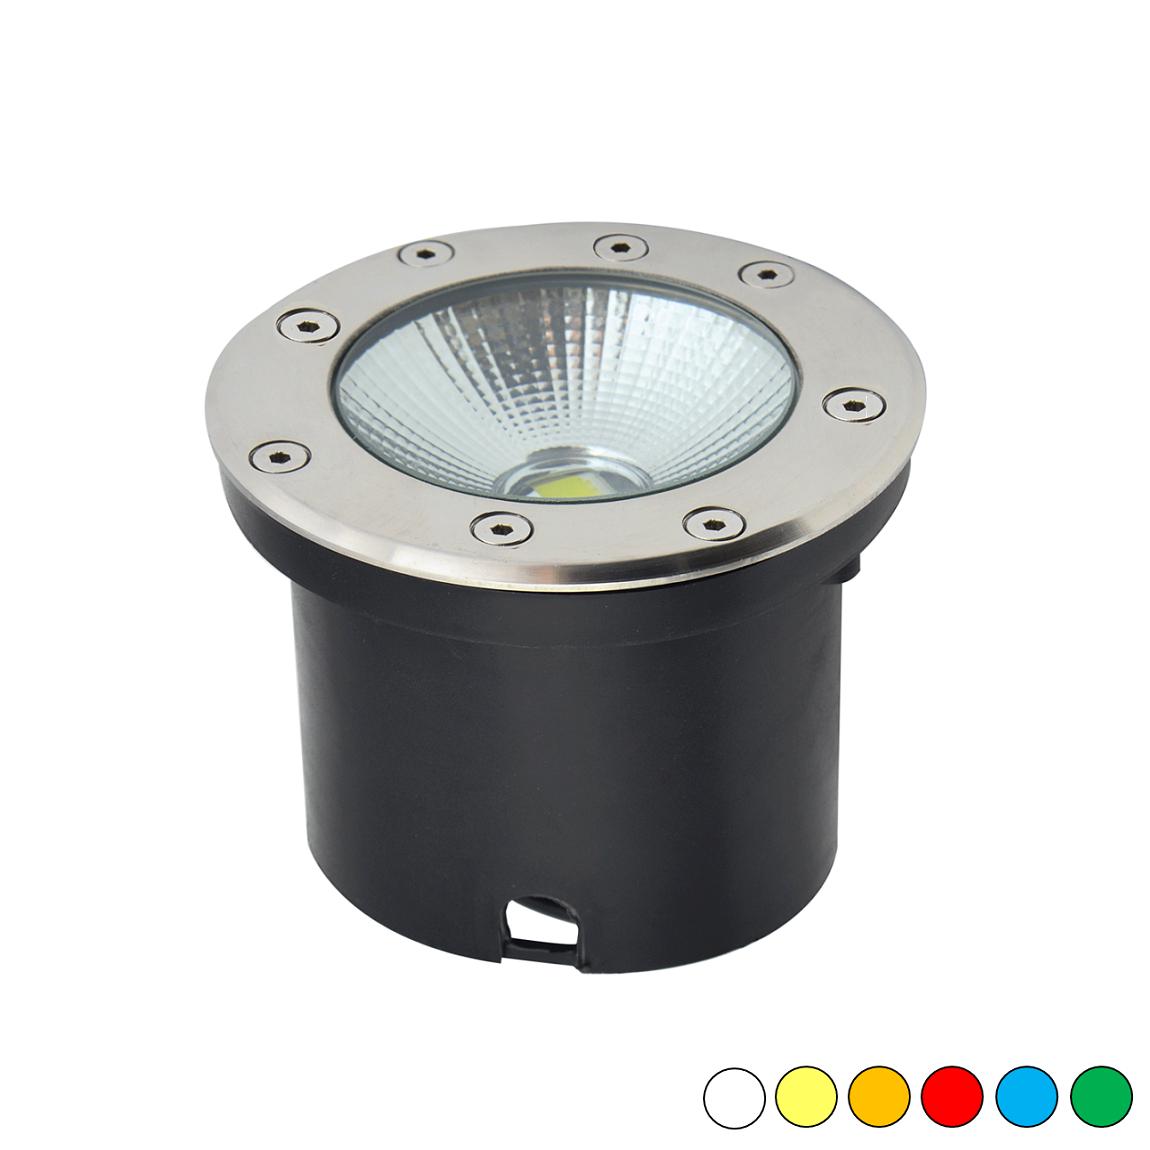 FORLIFE FL-2093 - 10 Watt Sıva Altı LED Wallwasher